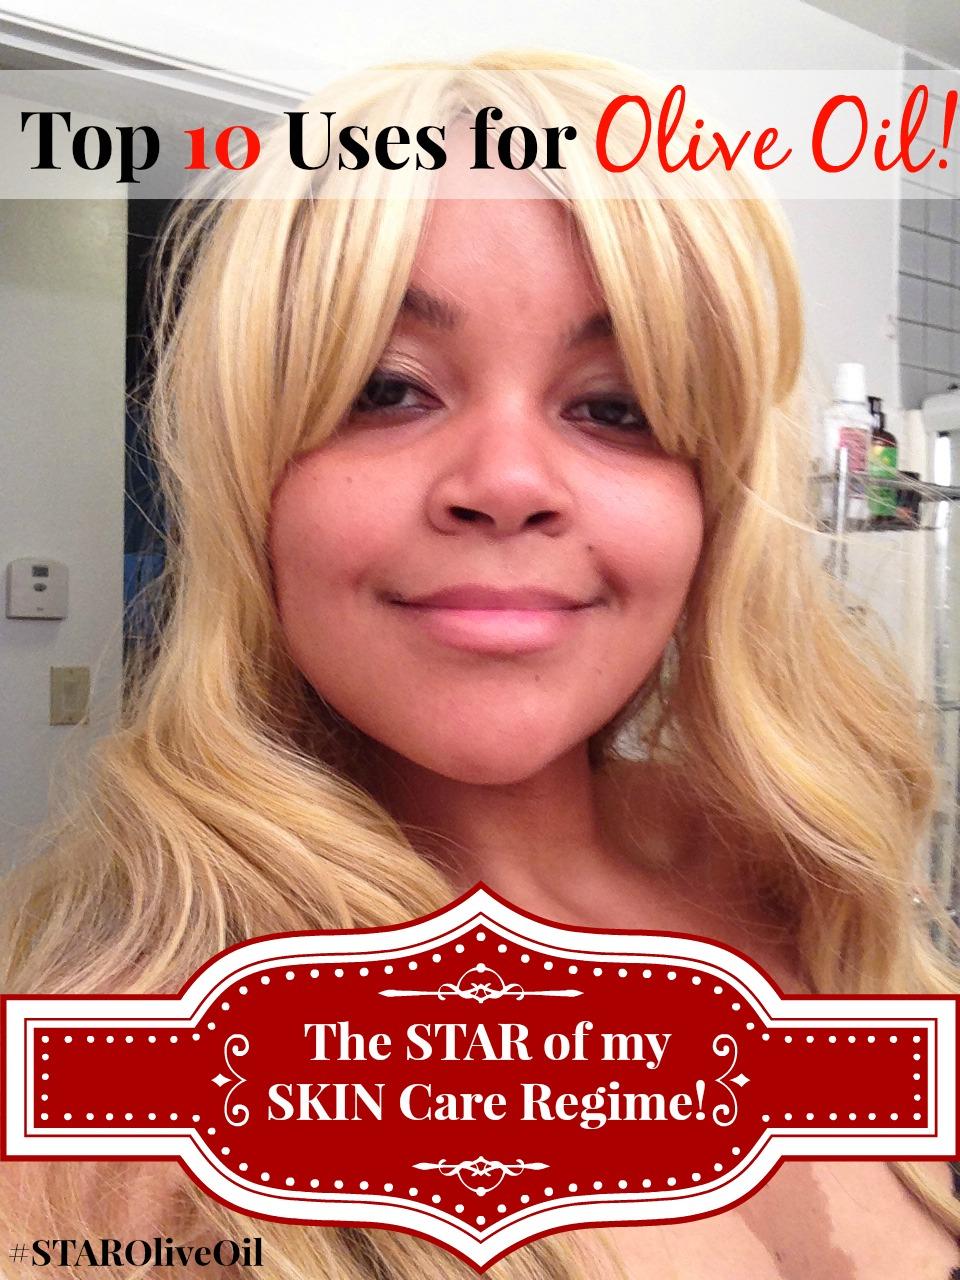 #StarOliveOil #shop #cbias Skin care